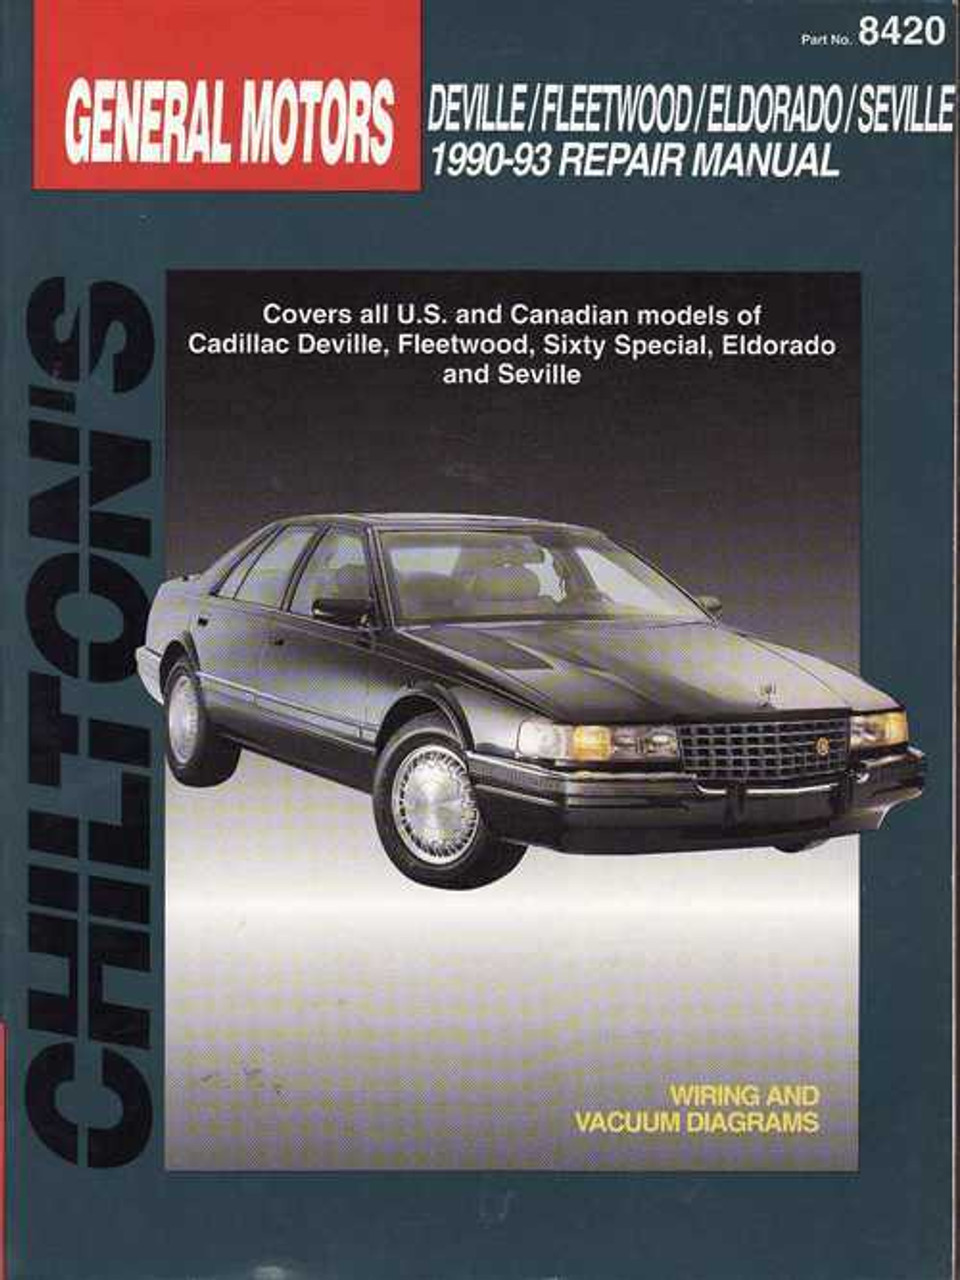 cadillac deville fleetwood seville 1990 1993 workshop manual rh automotobookshop com au 1982 Cadillac Fleetwood Brougham 1982 Cadillac Fleetwood Brougham